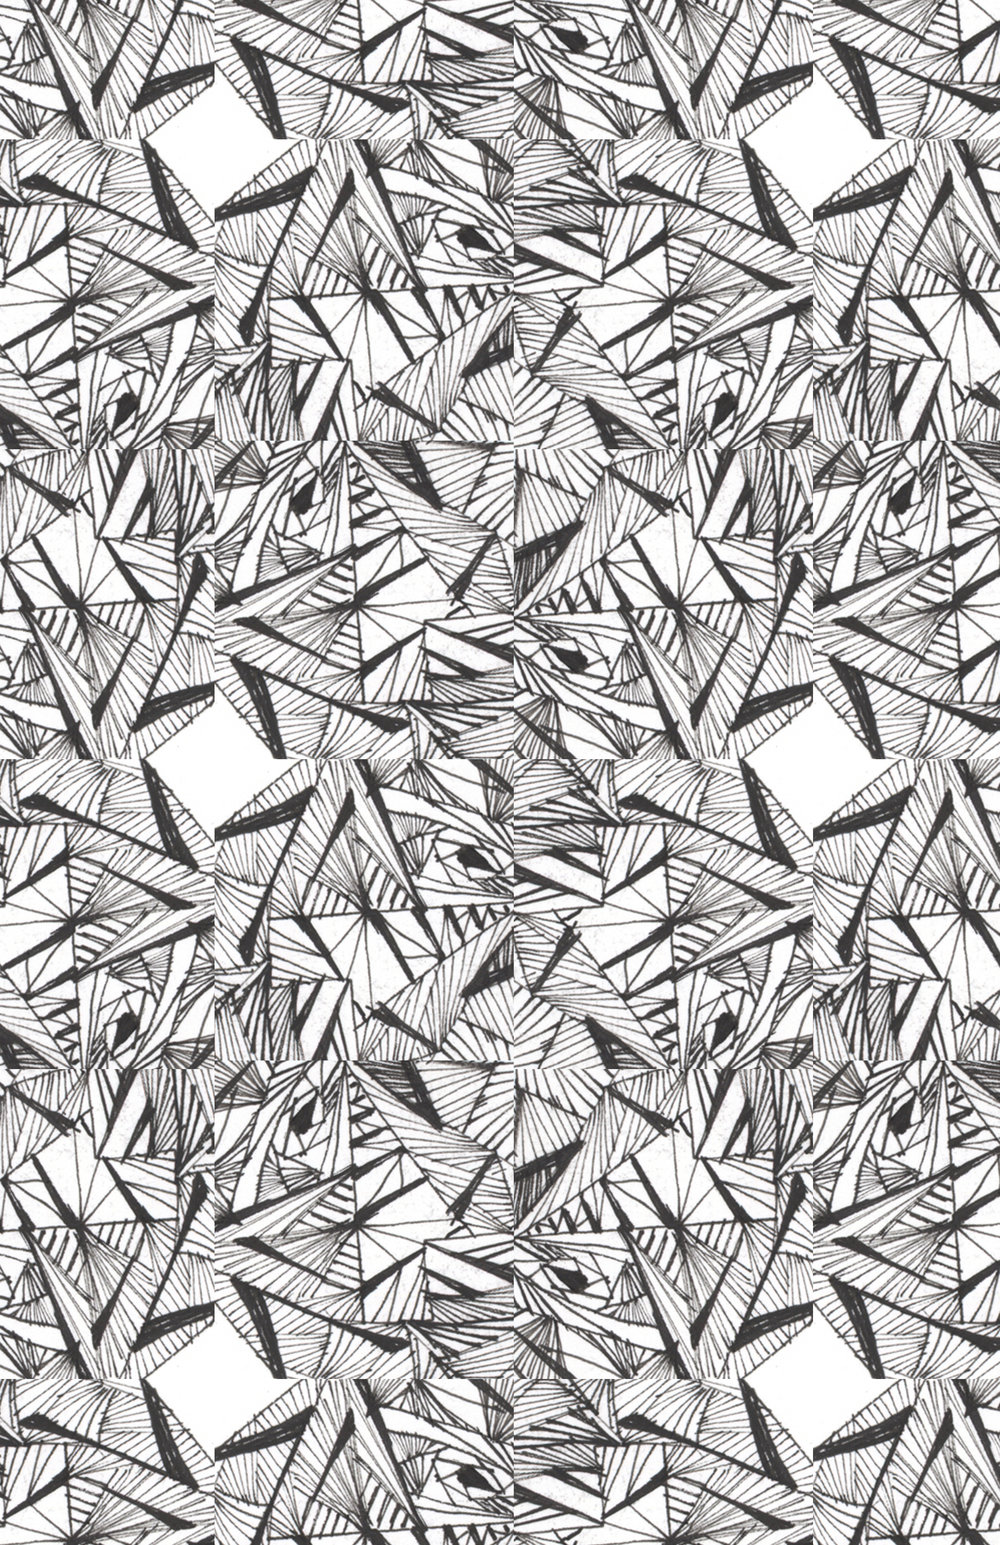 pattern4-1.jpg